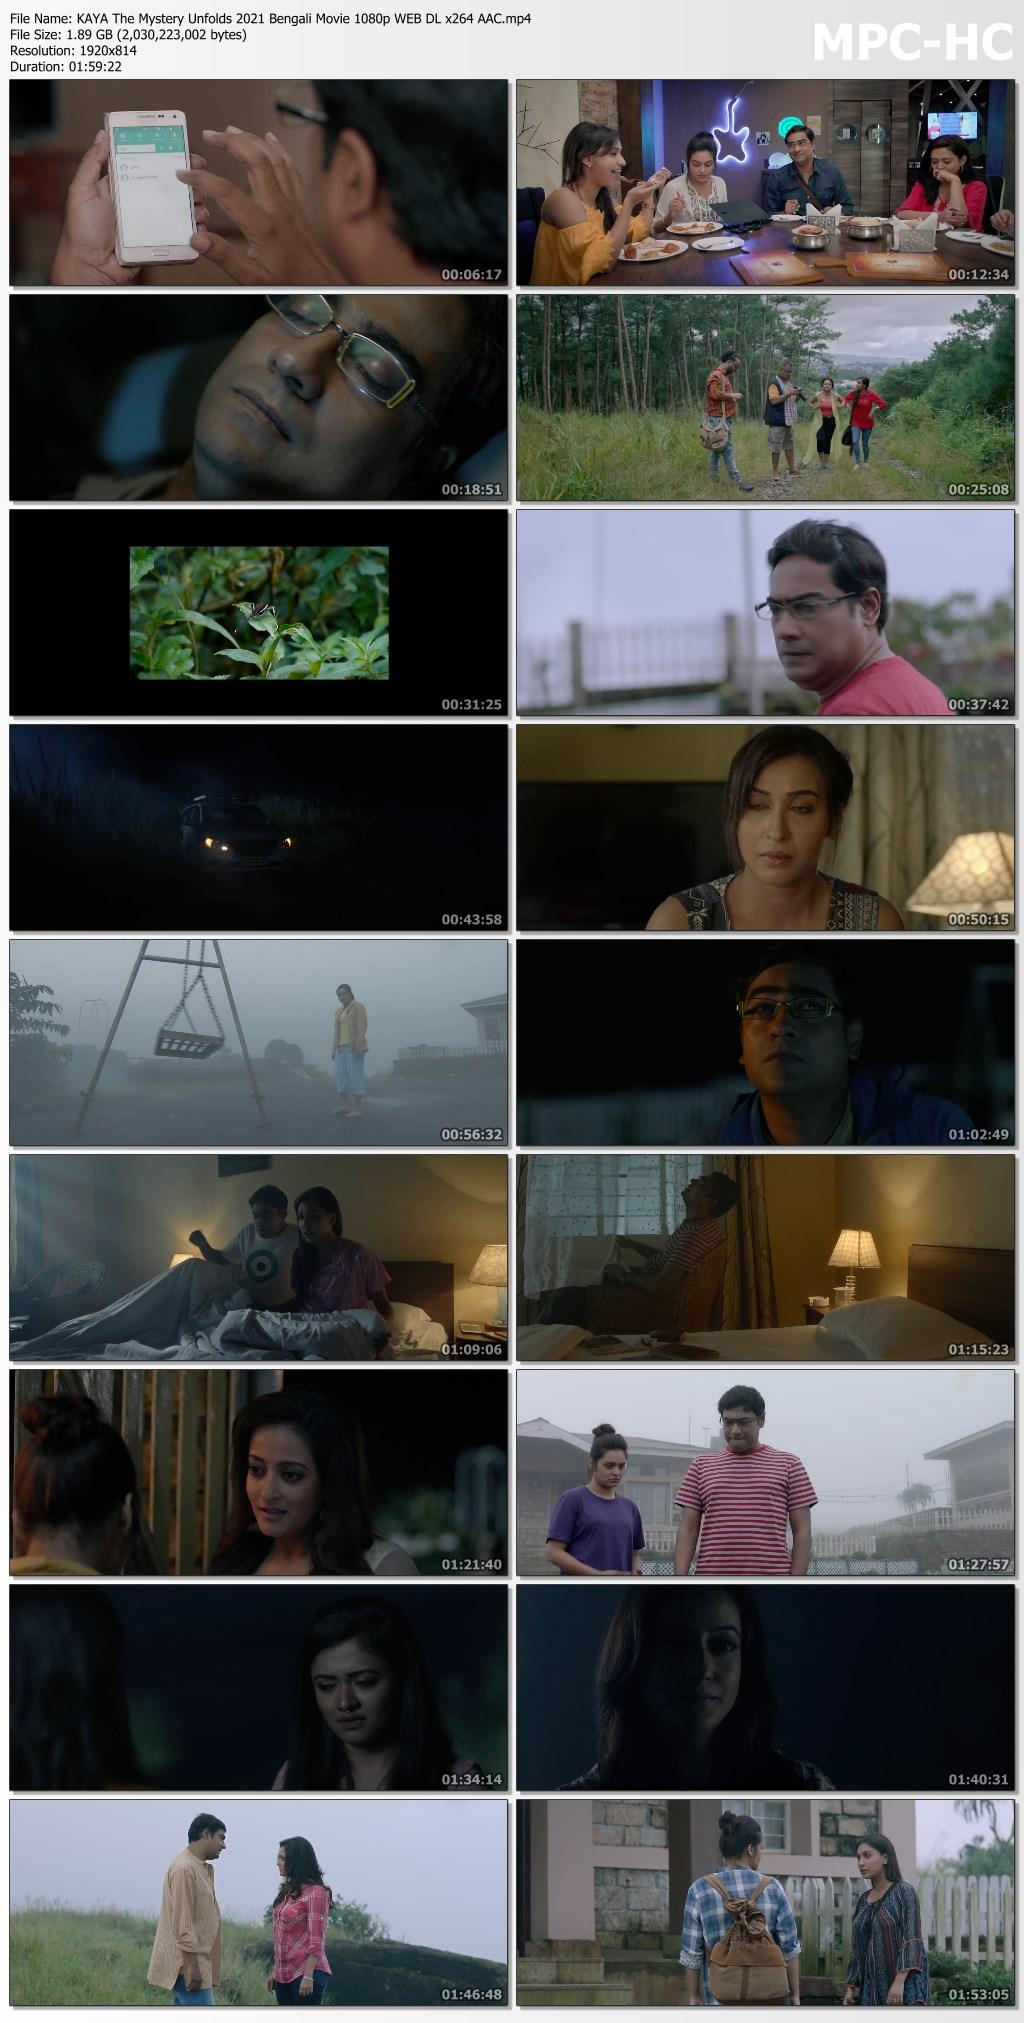 KAYA The Mystery Unfolds 2021 Bengali Movie 1080p WEB DL x264 AAC.mp4 thumbs